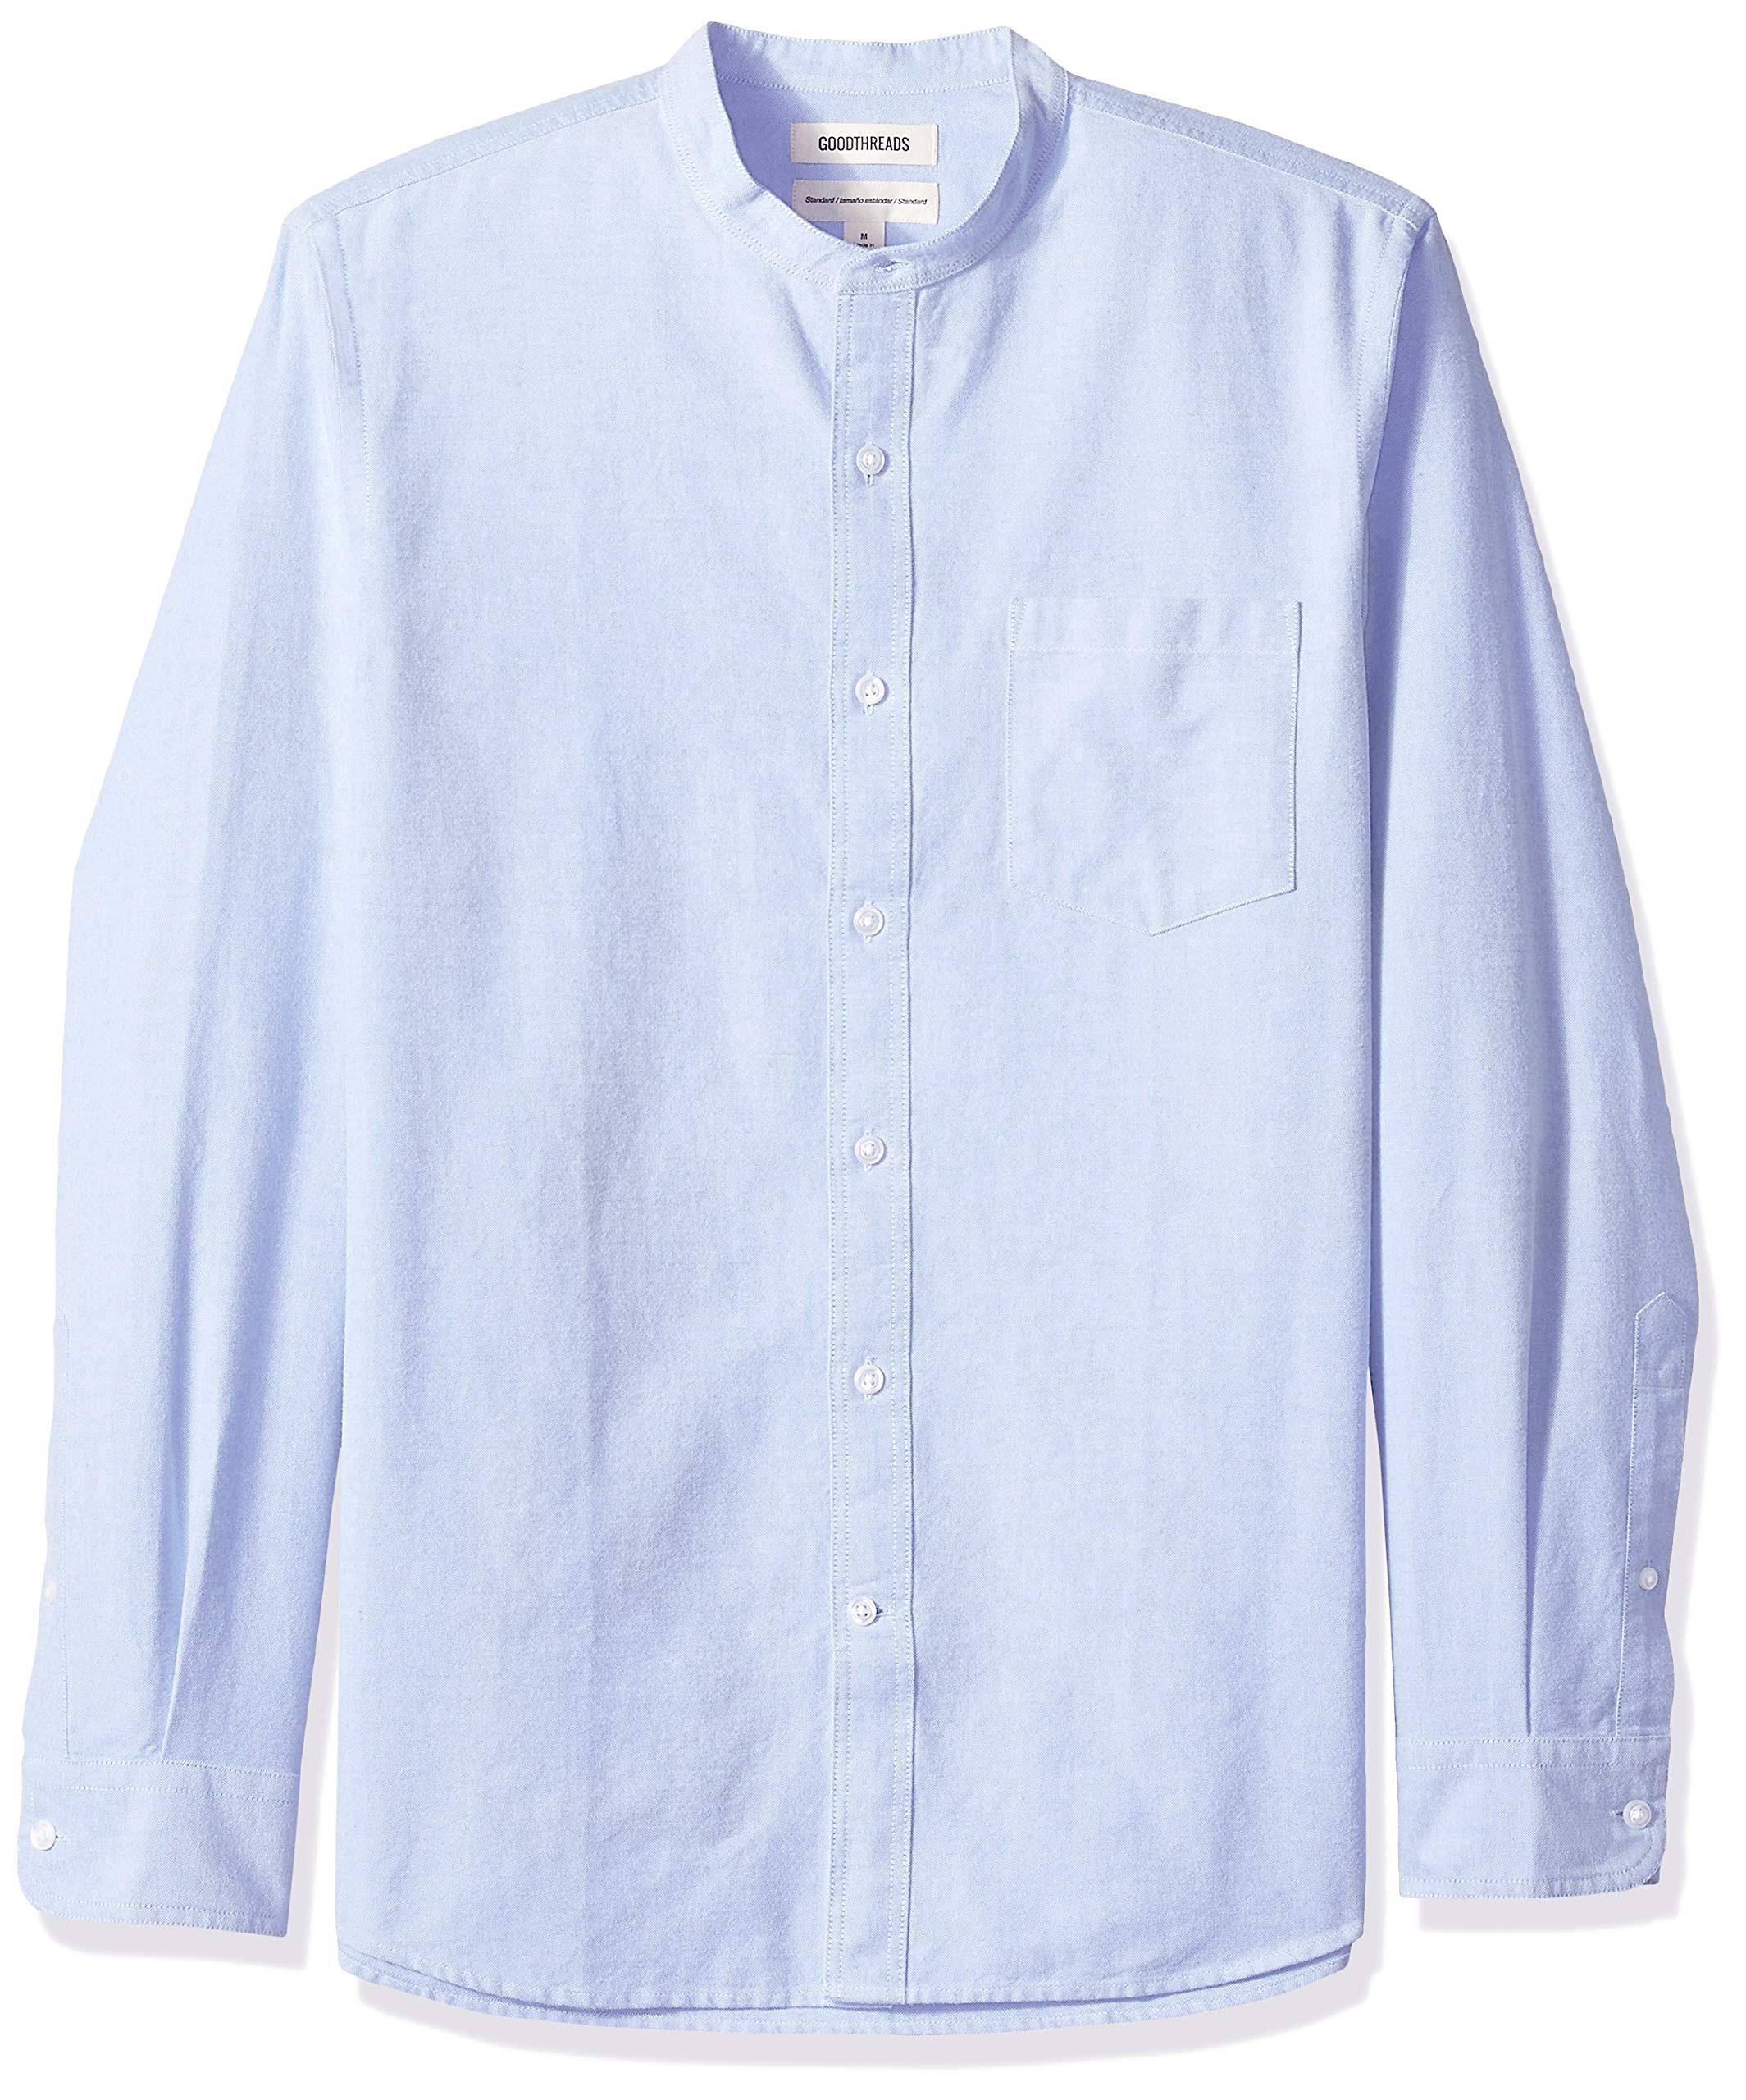 Alto Y Larga Hombre Estándar Oxford Cuello Para Goodthreads Camisa De Manga qx4Ign